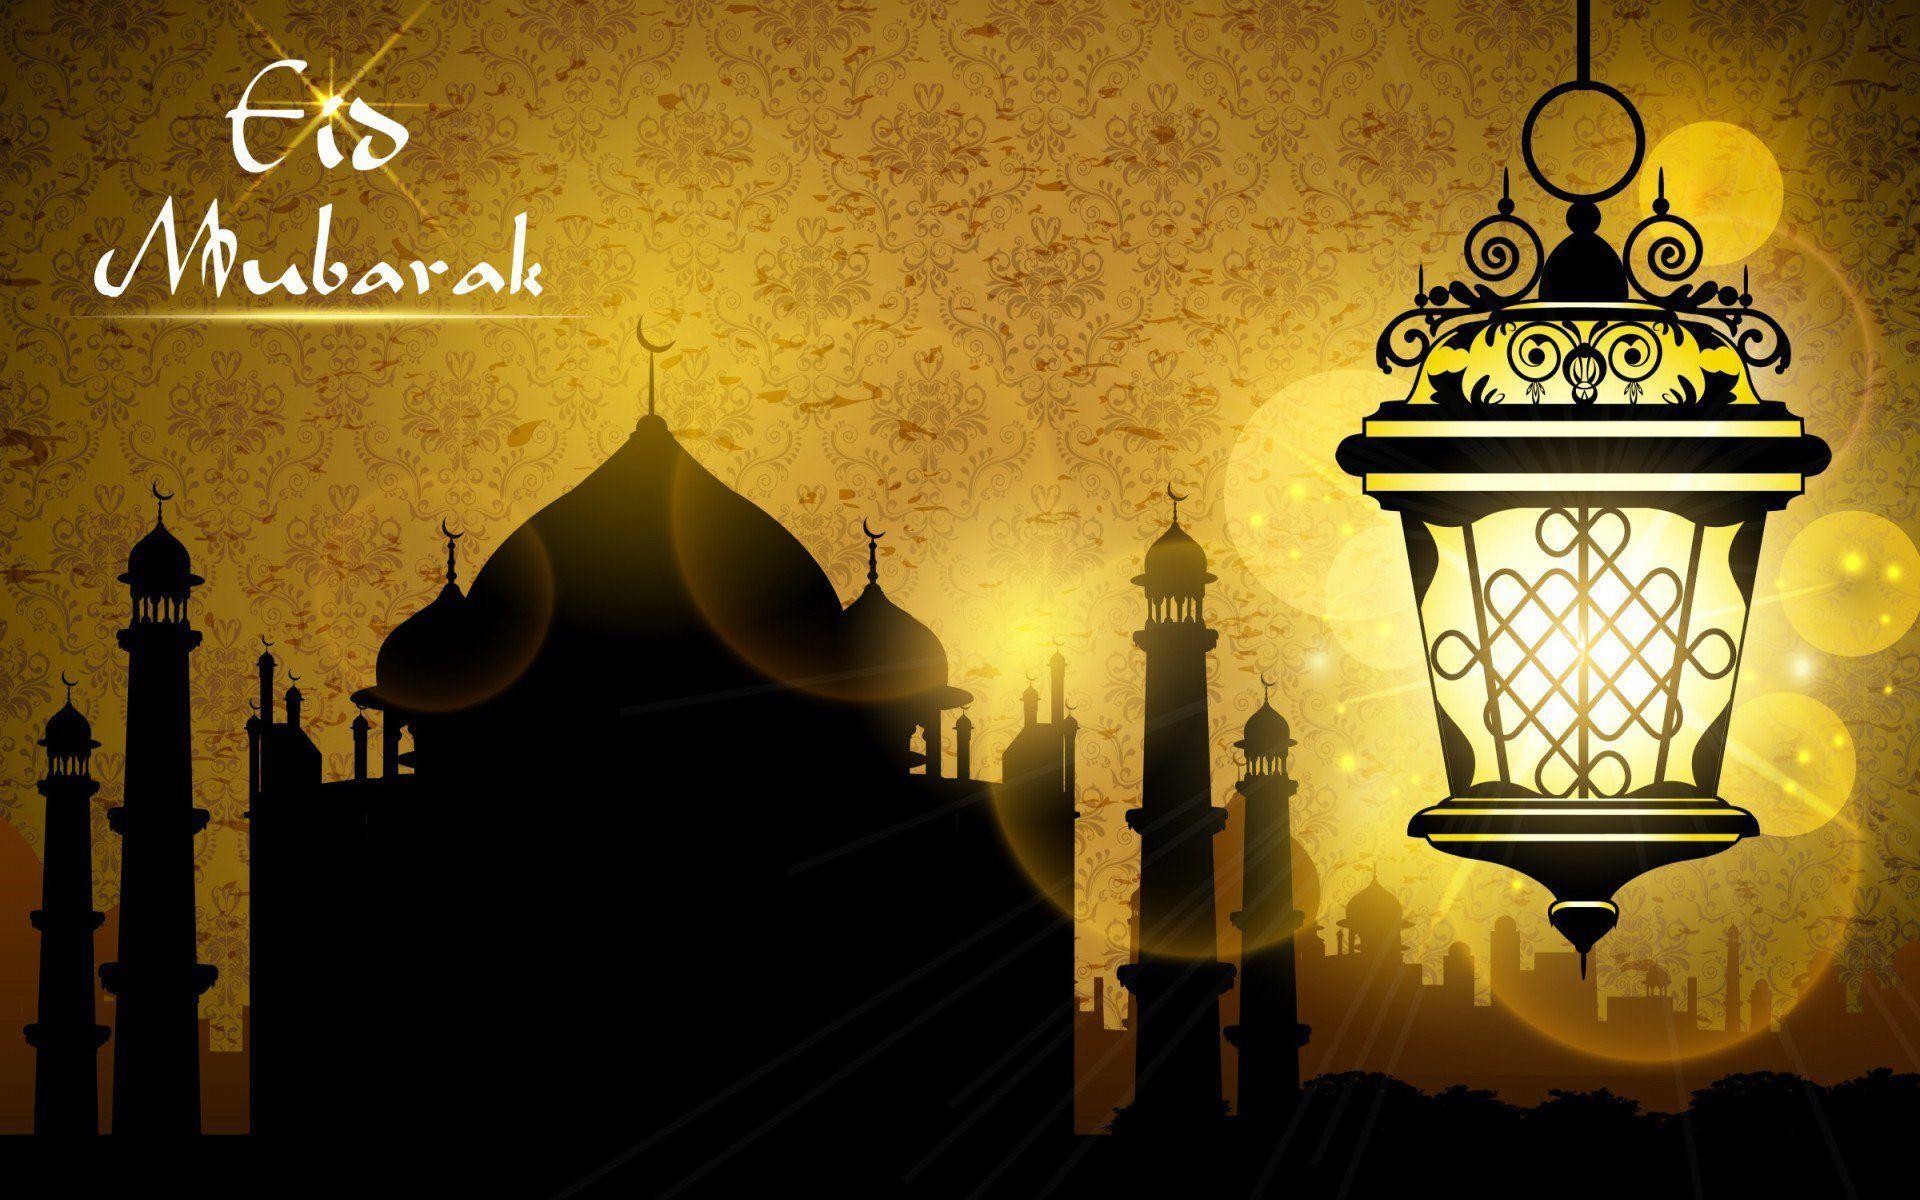 Full HD Eid Mubarak 2016 Desktop Wallpaper Download Free